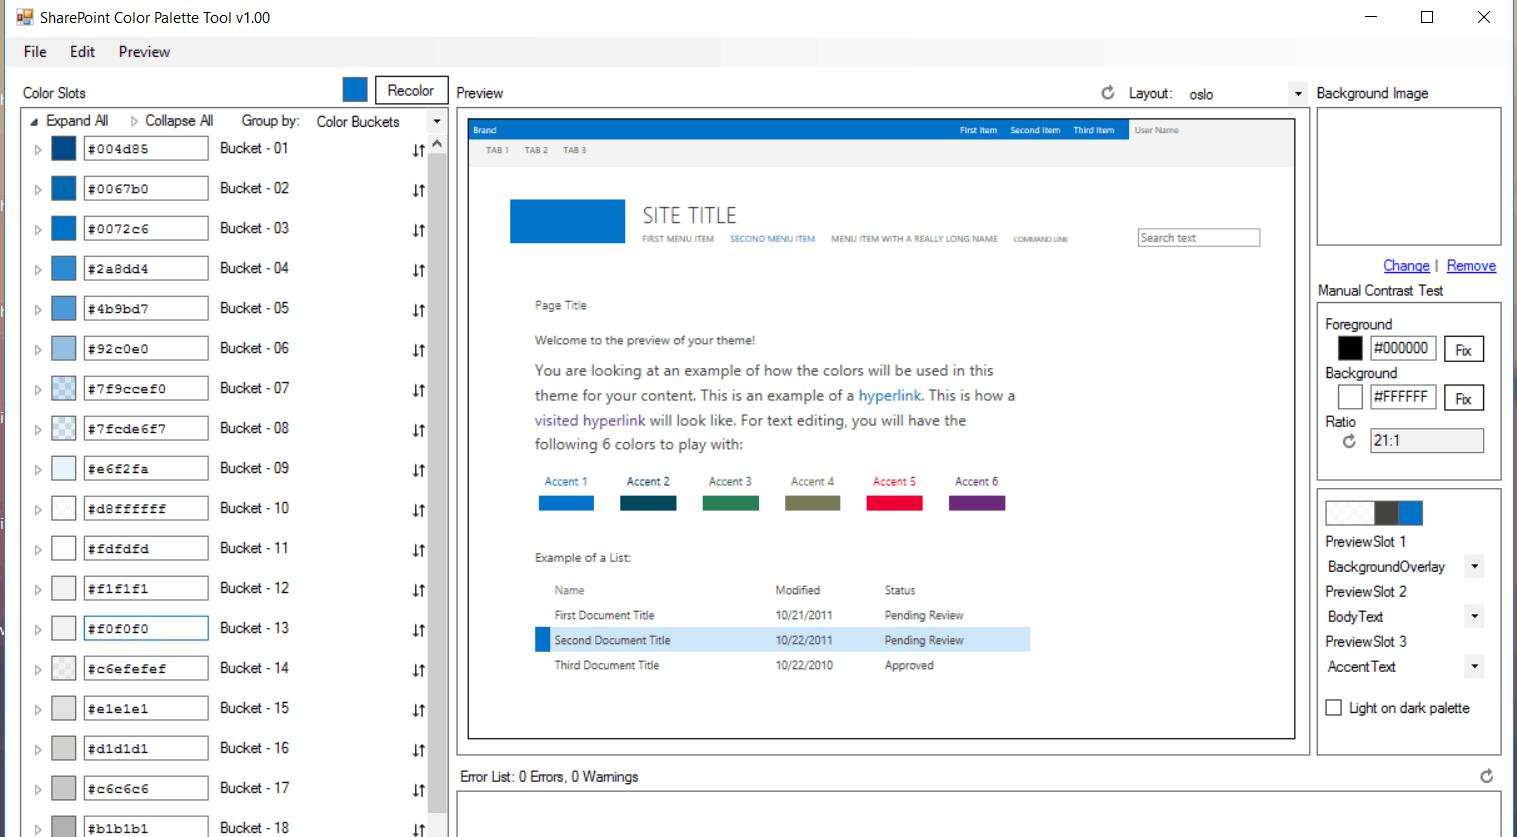 Deploy a custom theme in SharePoint